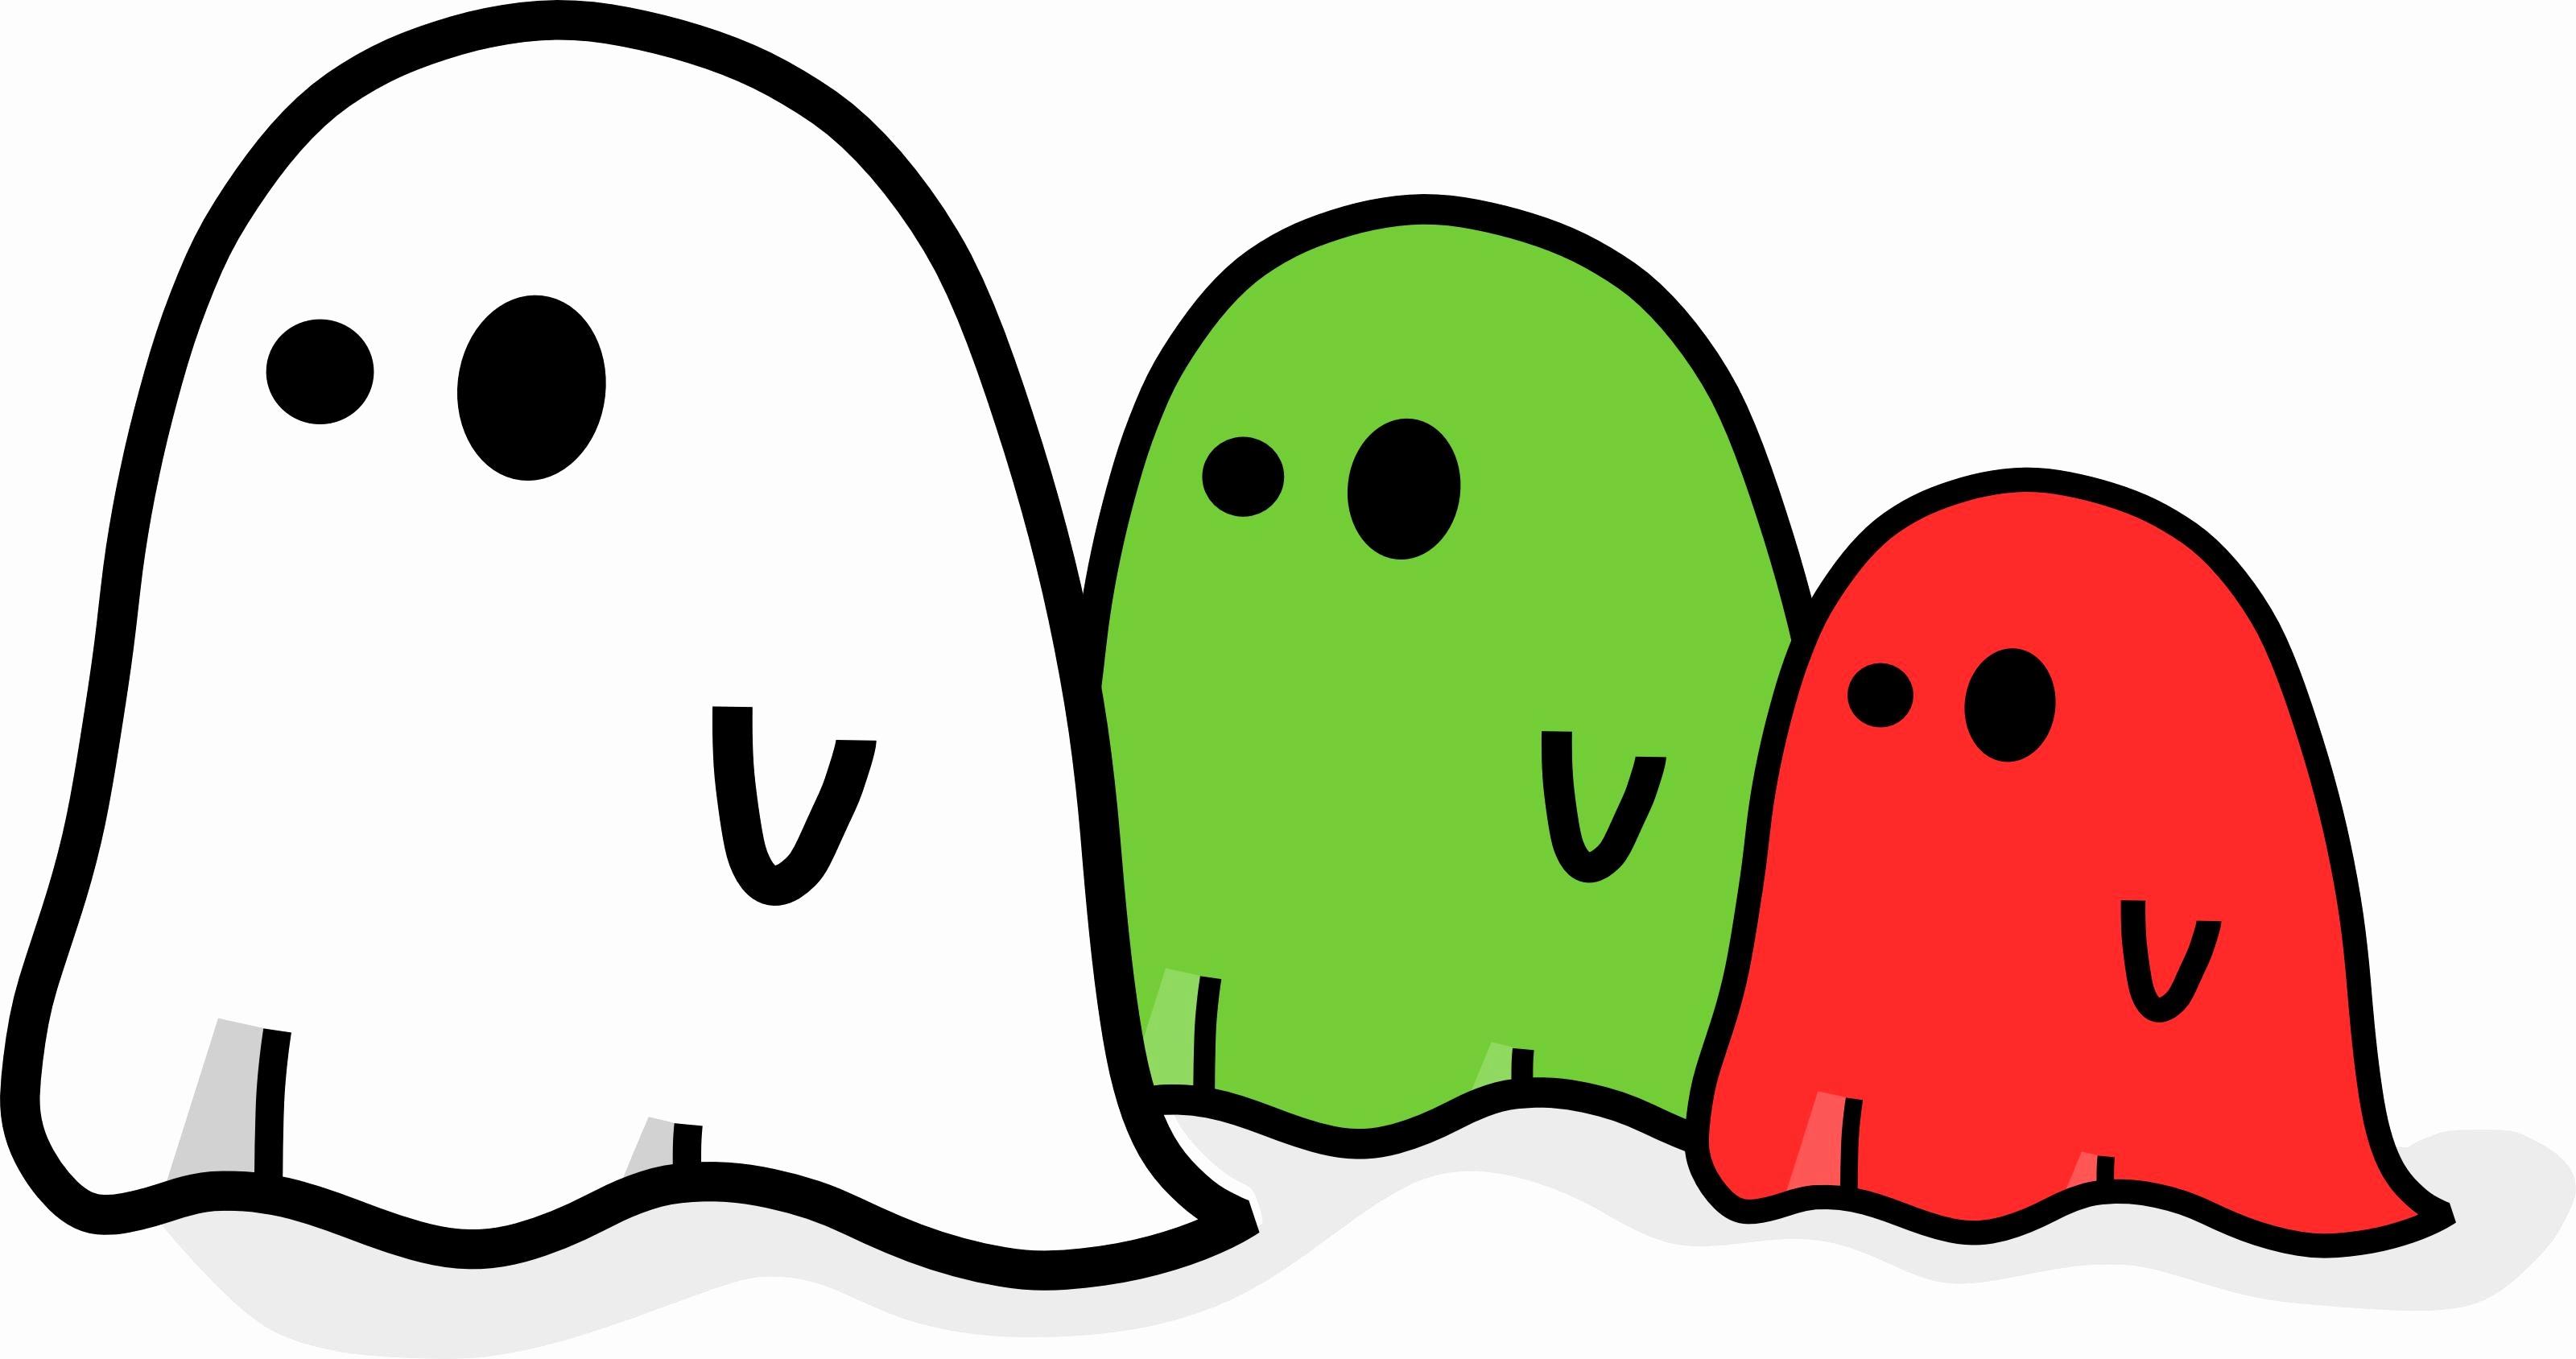 3200x1688 11 Unique Halloween Stencil Ghost